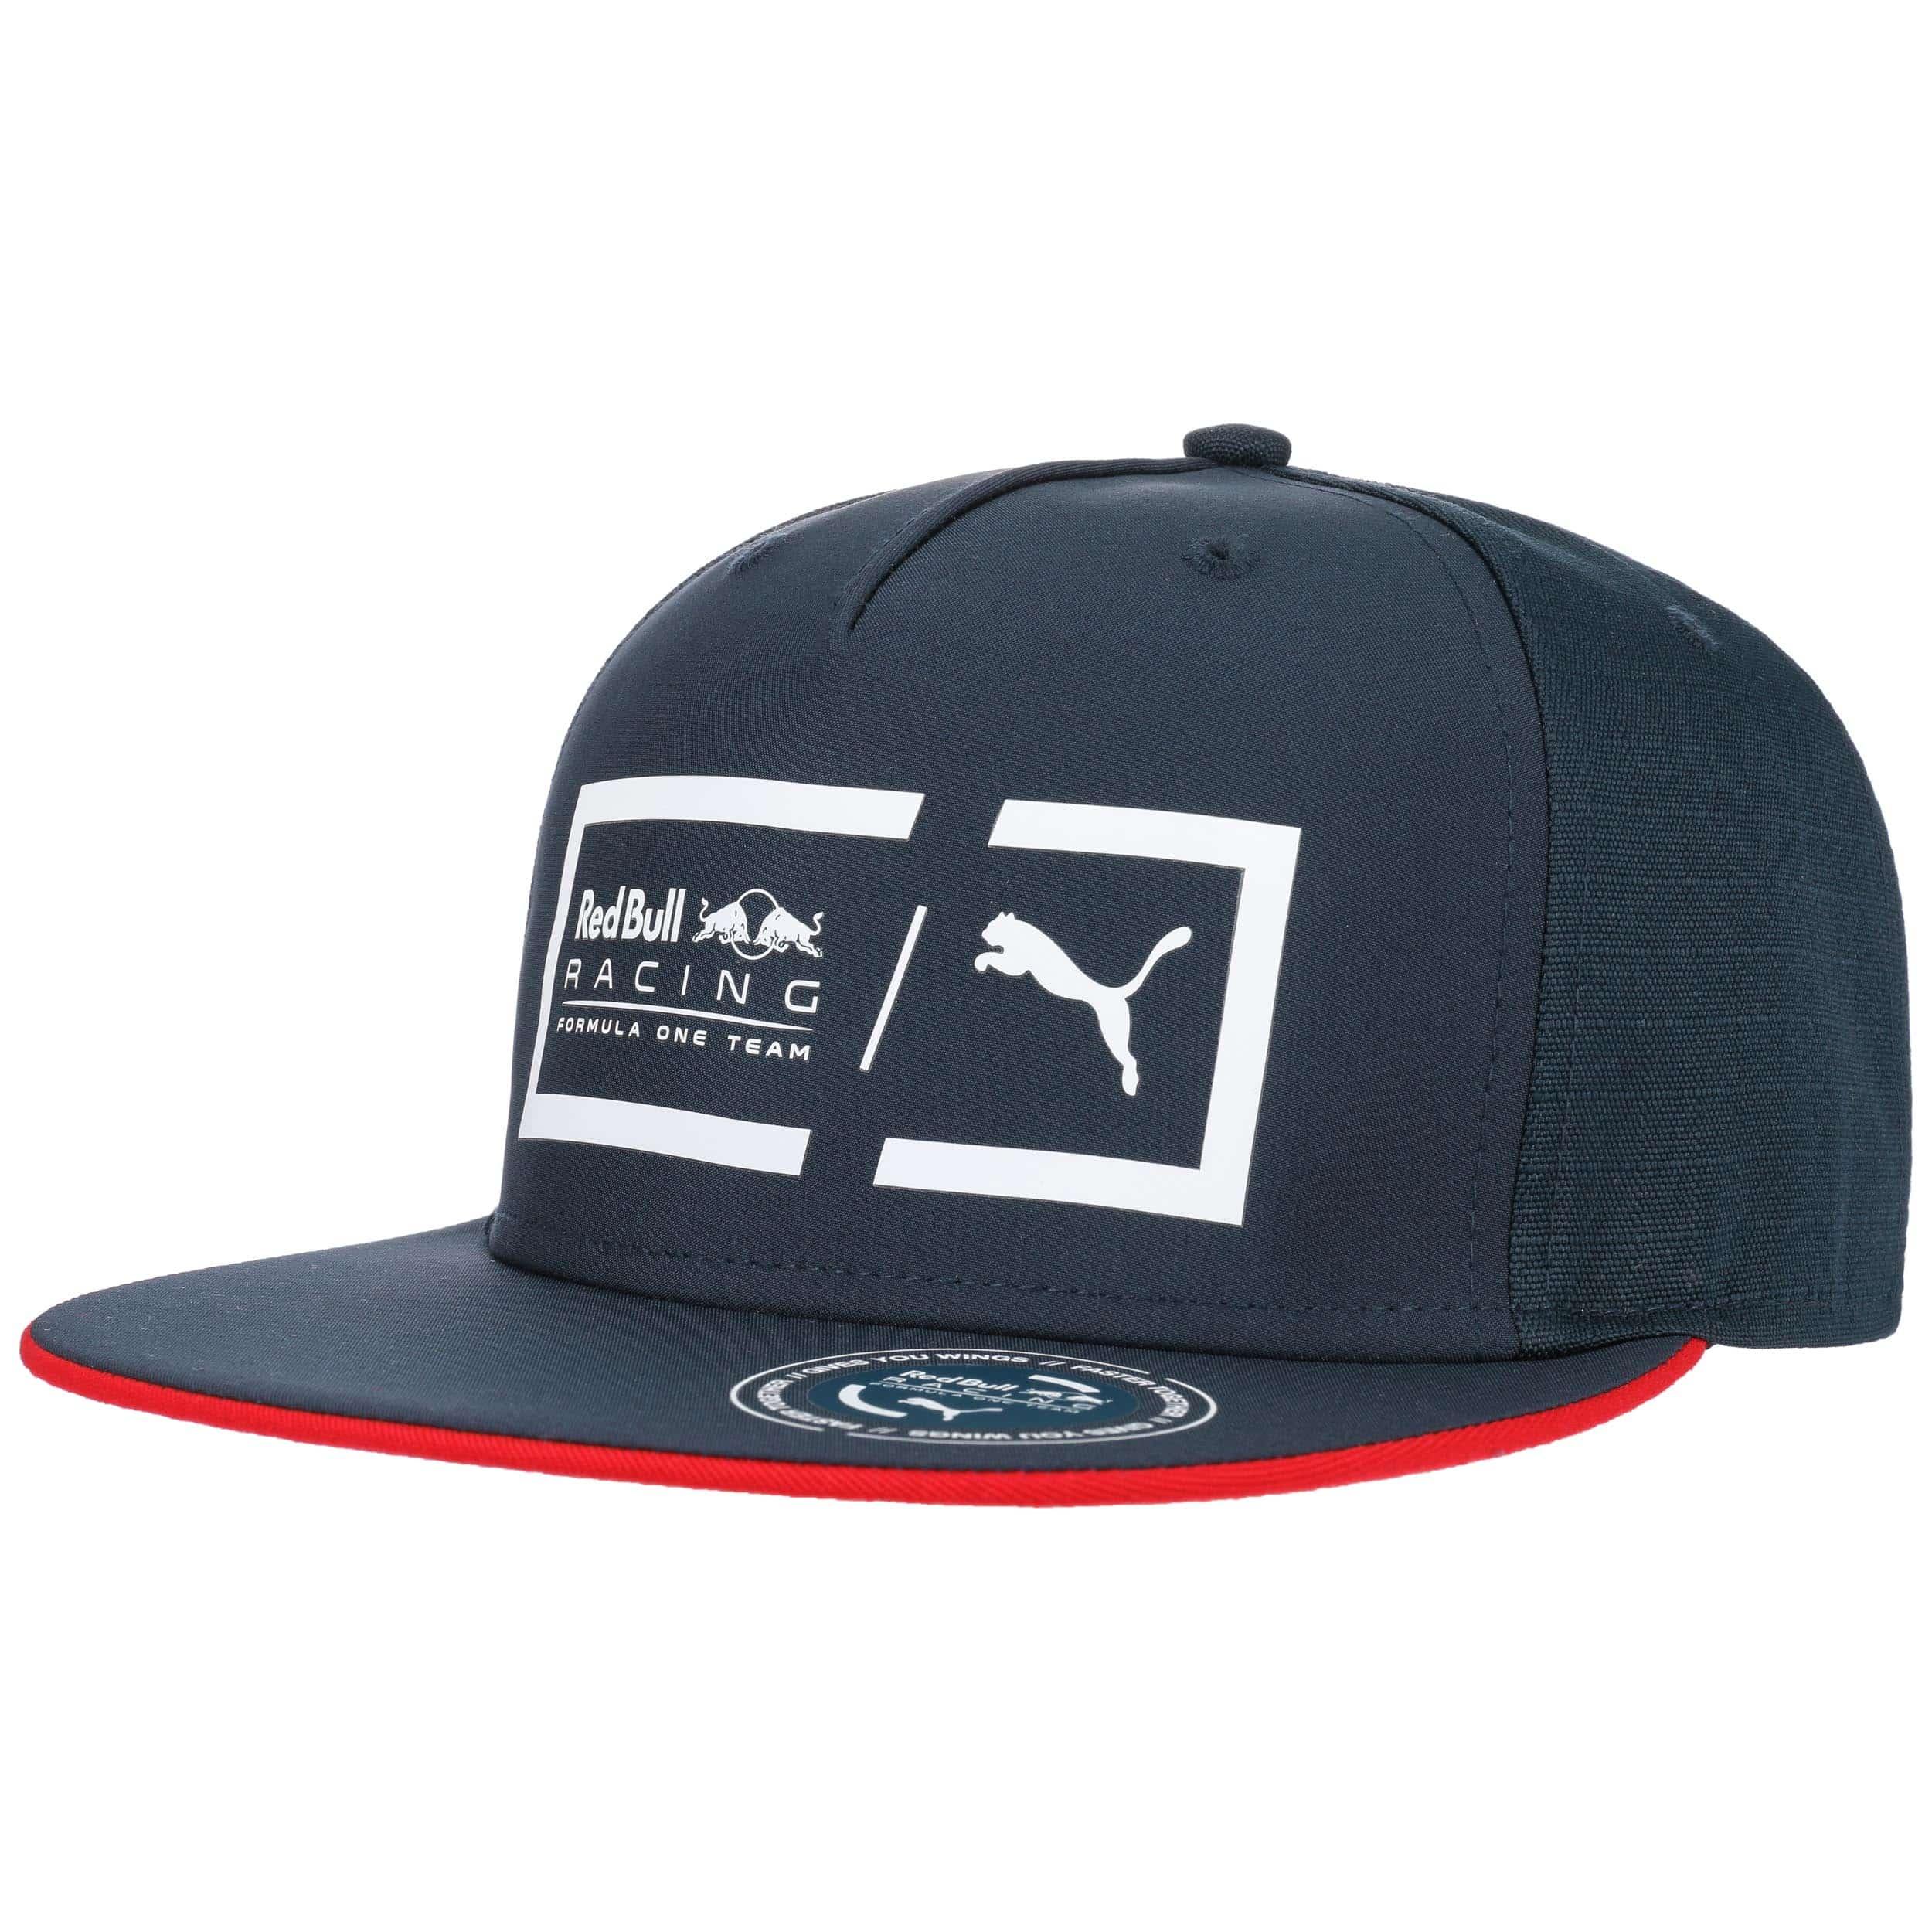 red bull racing flat brim cap by puma gbp 27 95 hats. Black Bedroom Furniture Sets. Home Design Ideas